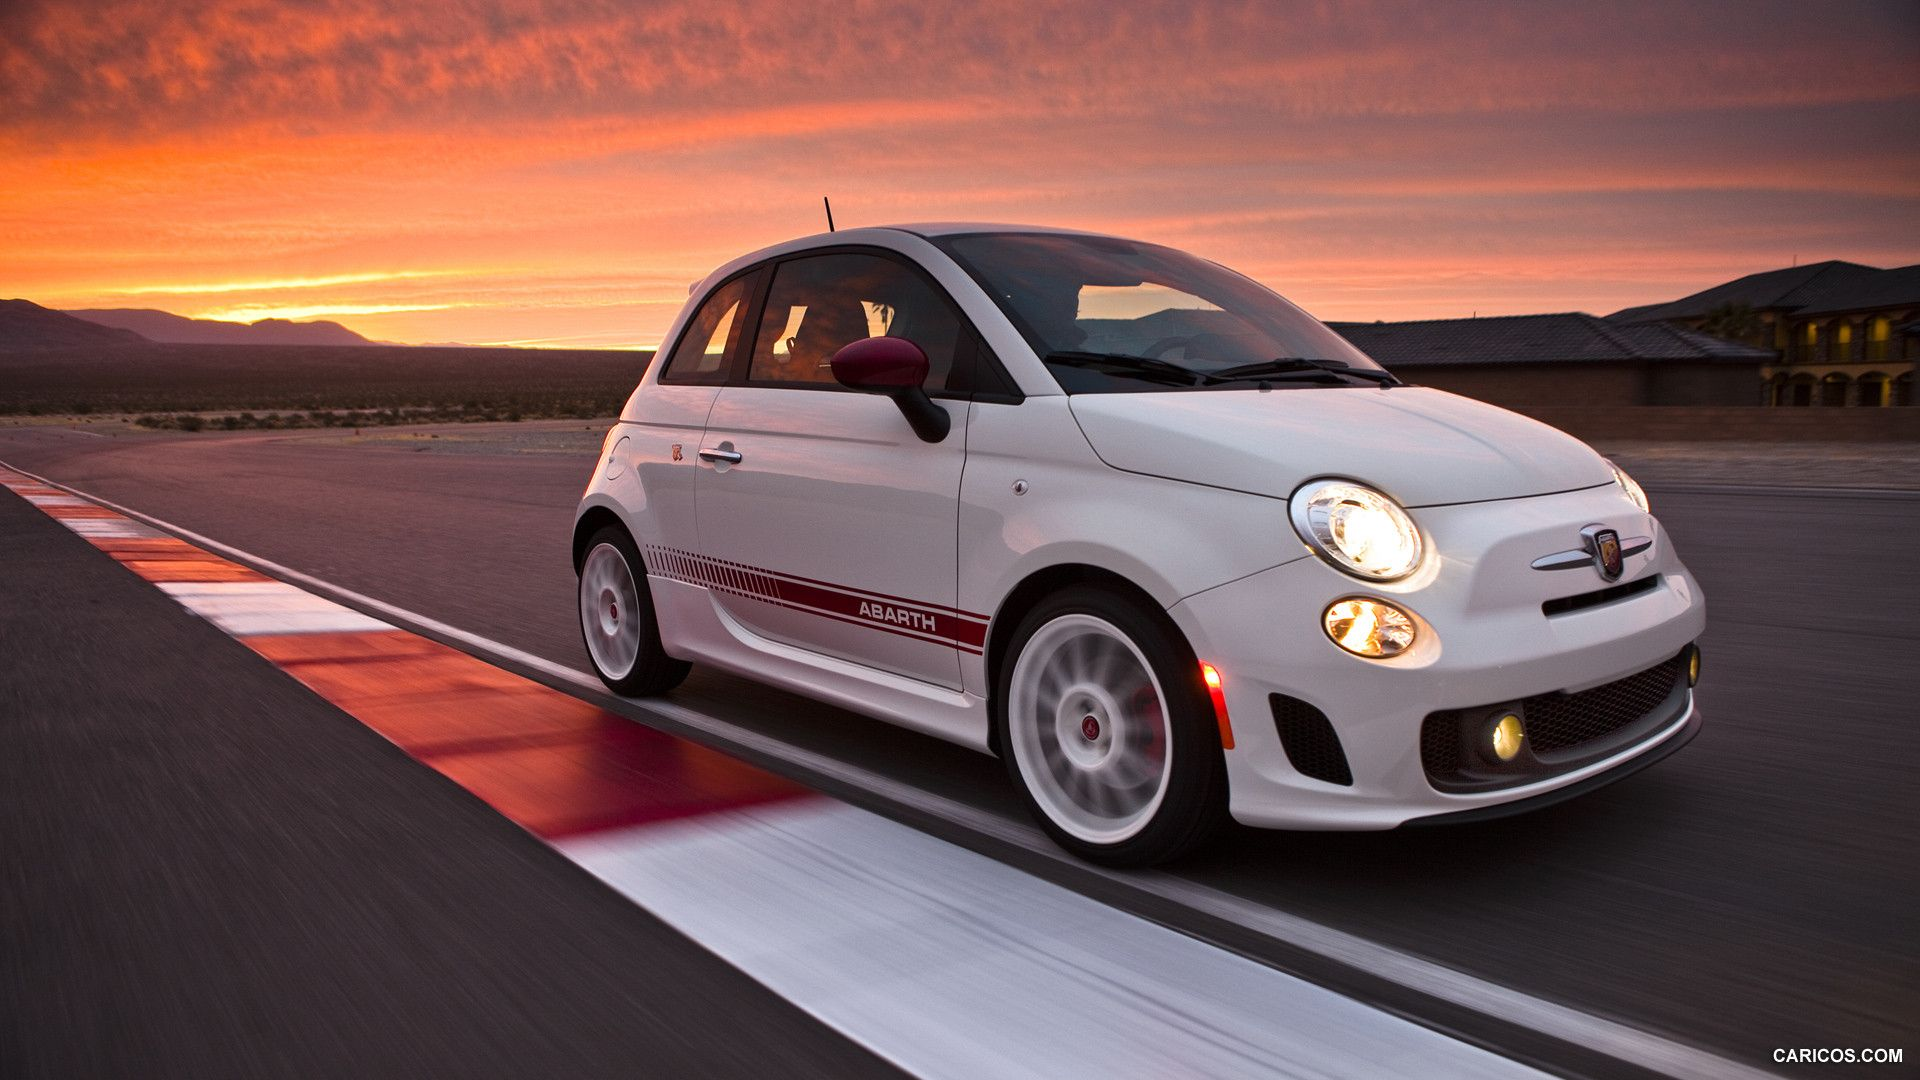 Rolling Fiat 500 Abarth